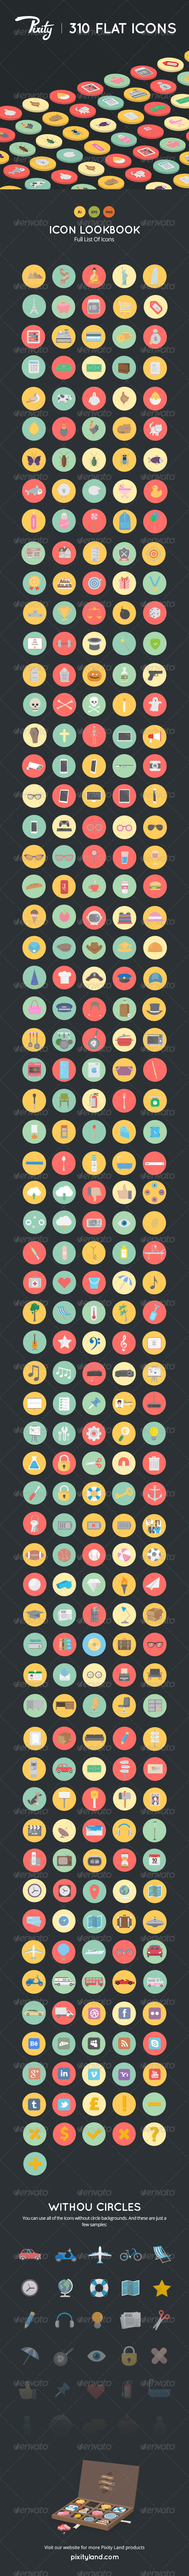 GraphicRiver Pixity 310 Flat Icons 7771249